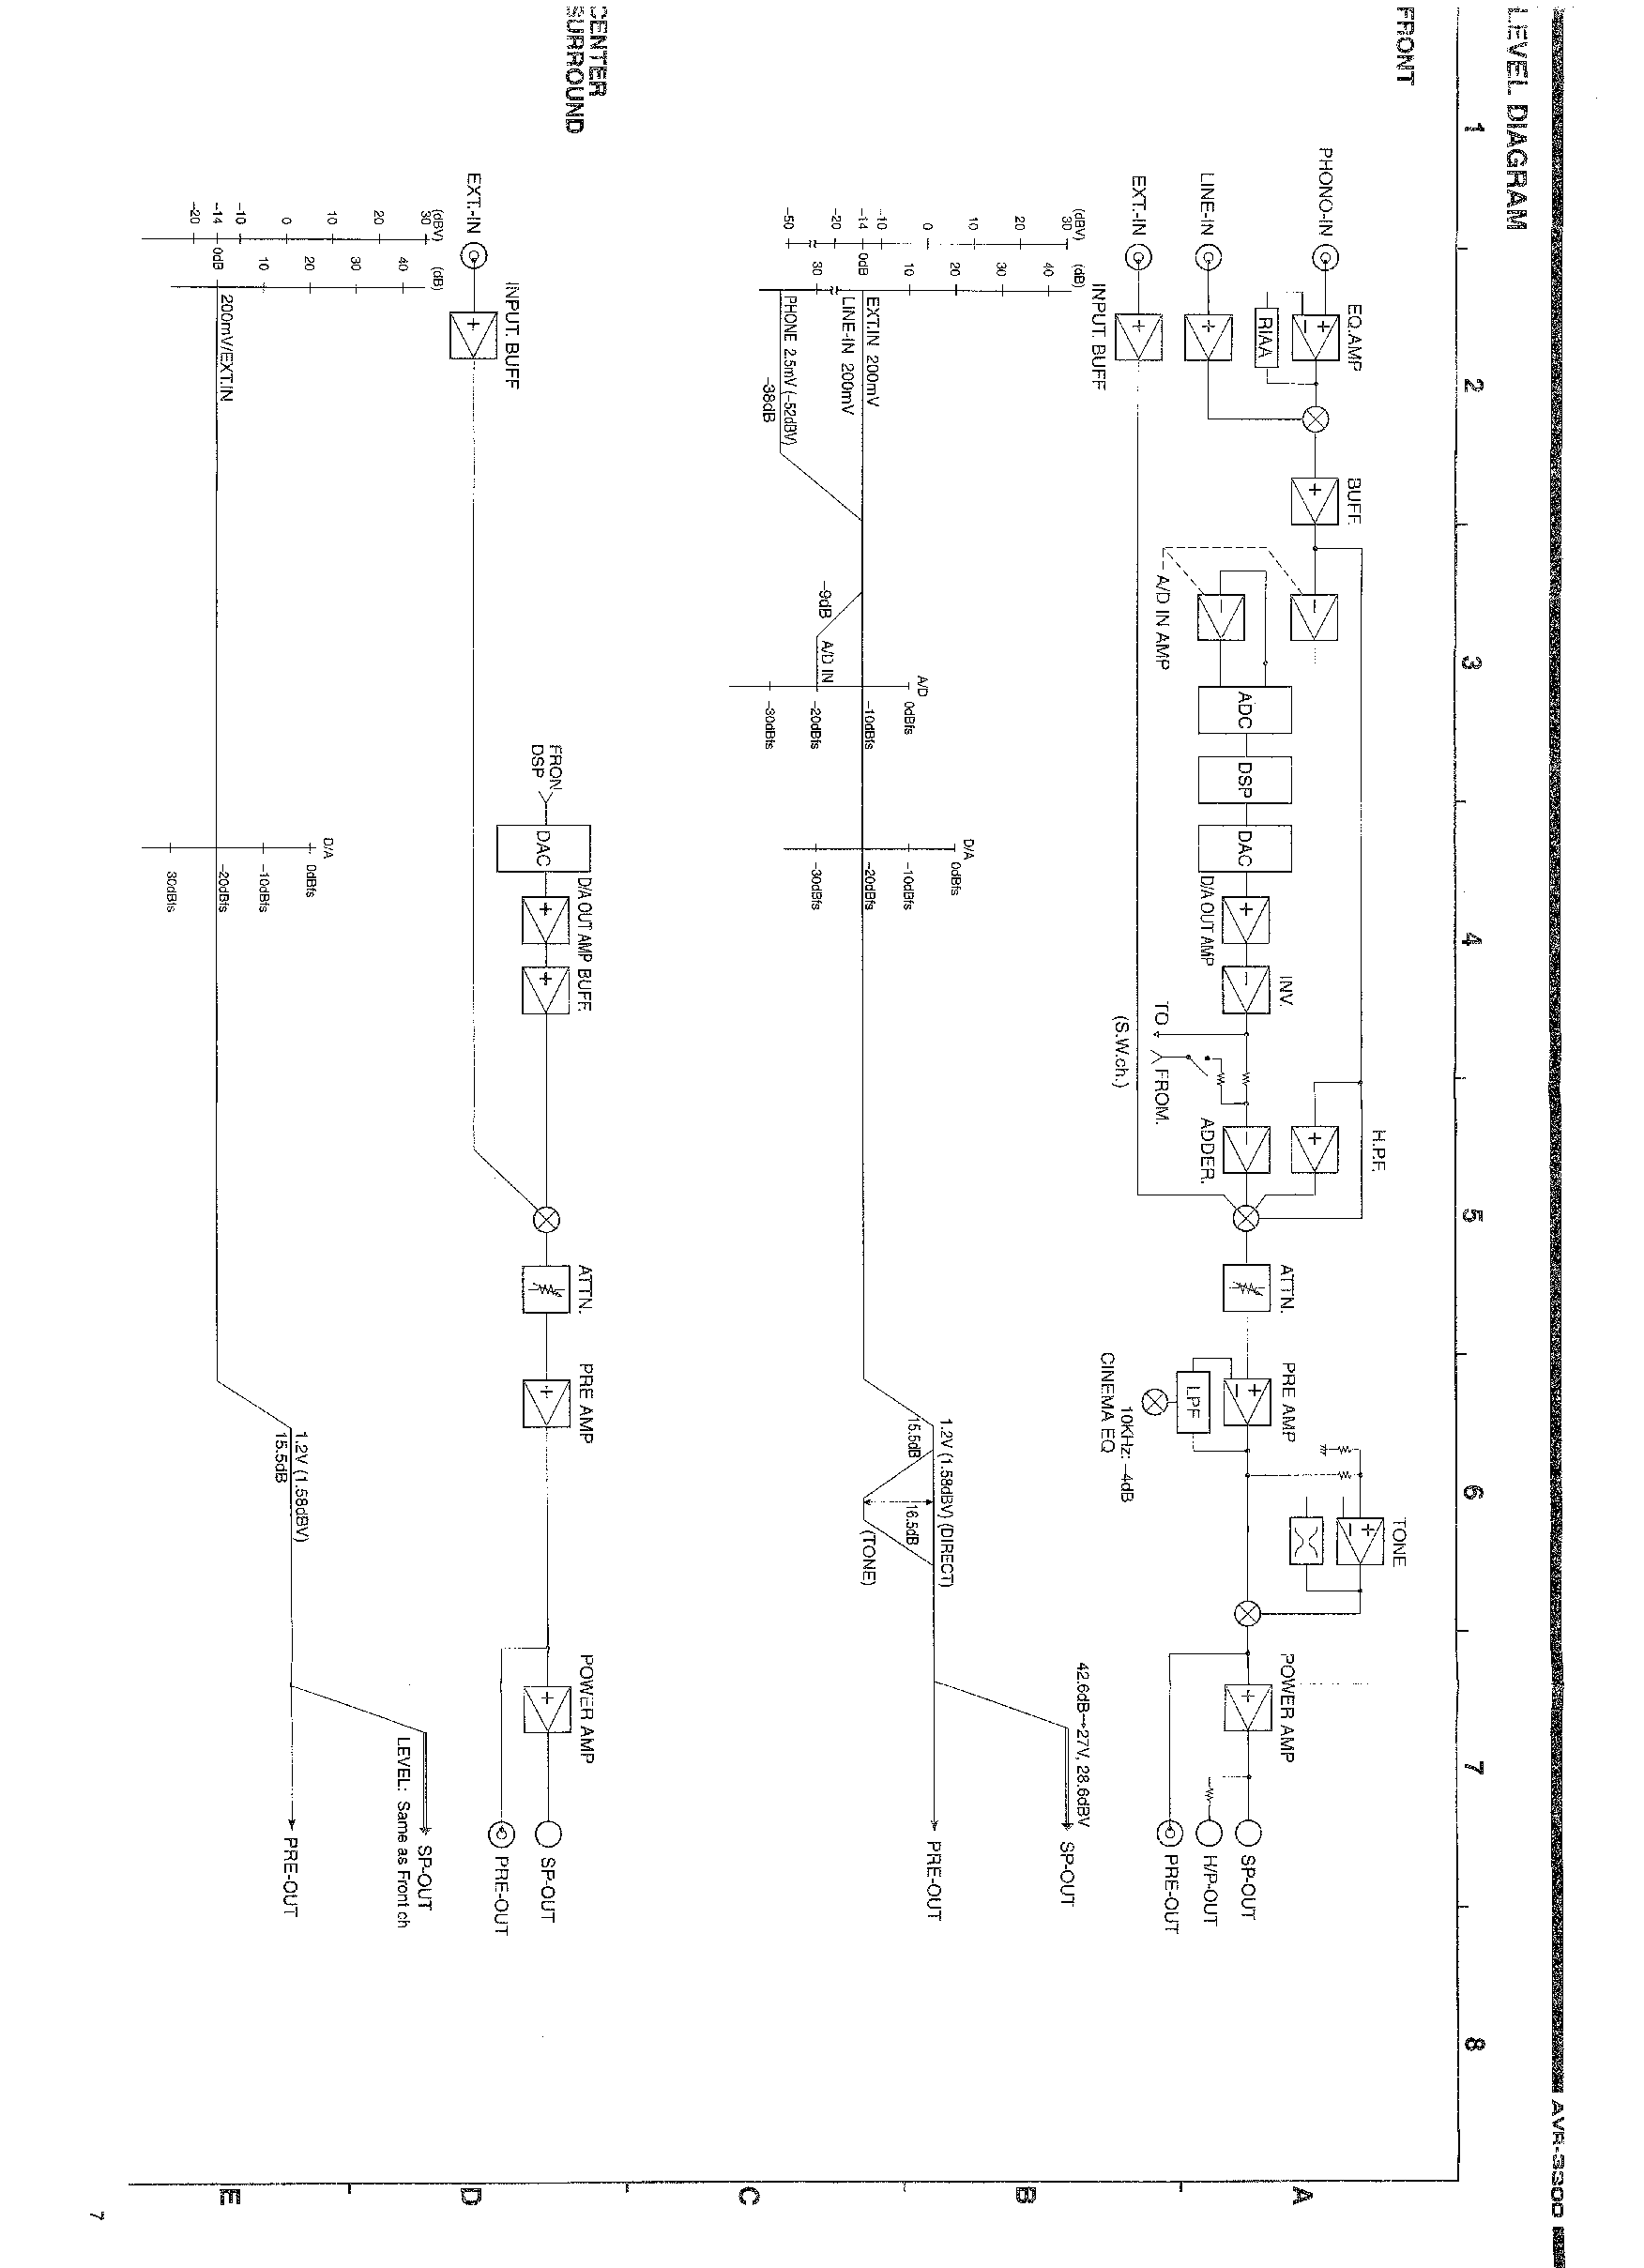 Rca Electrical Wiring Diagram 158628110 - Wiring Diagram